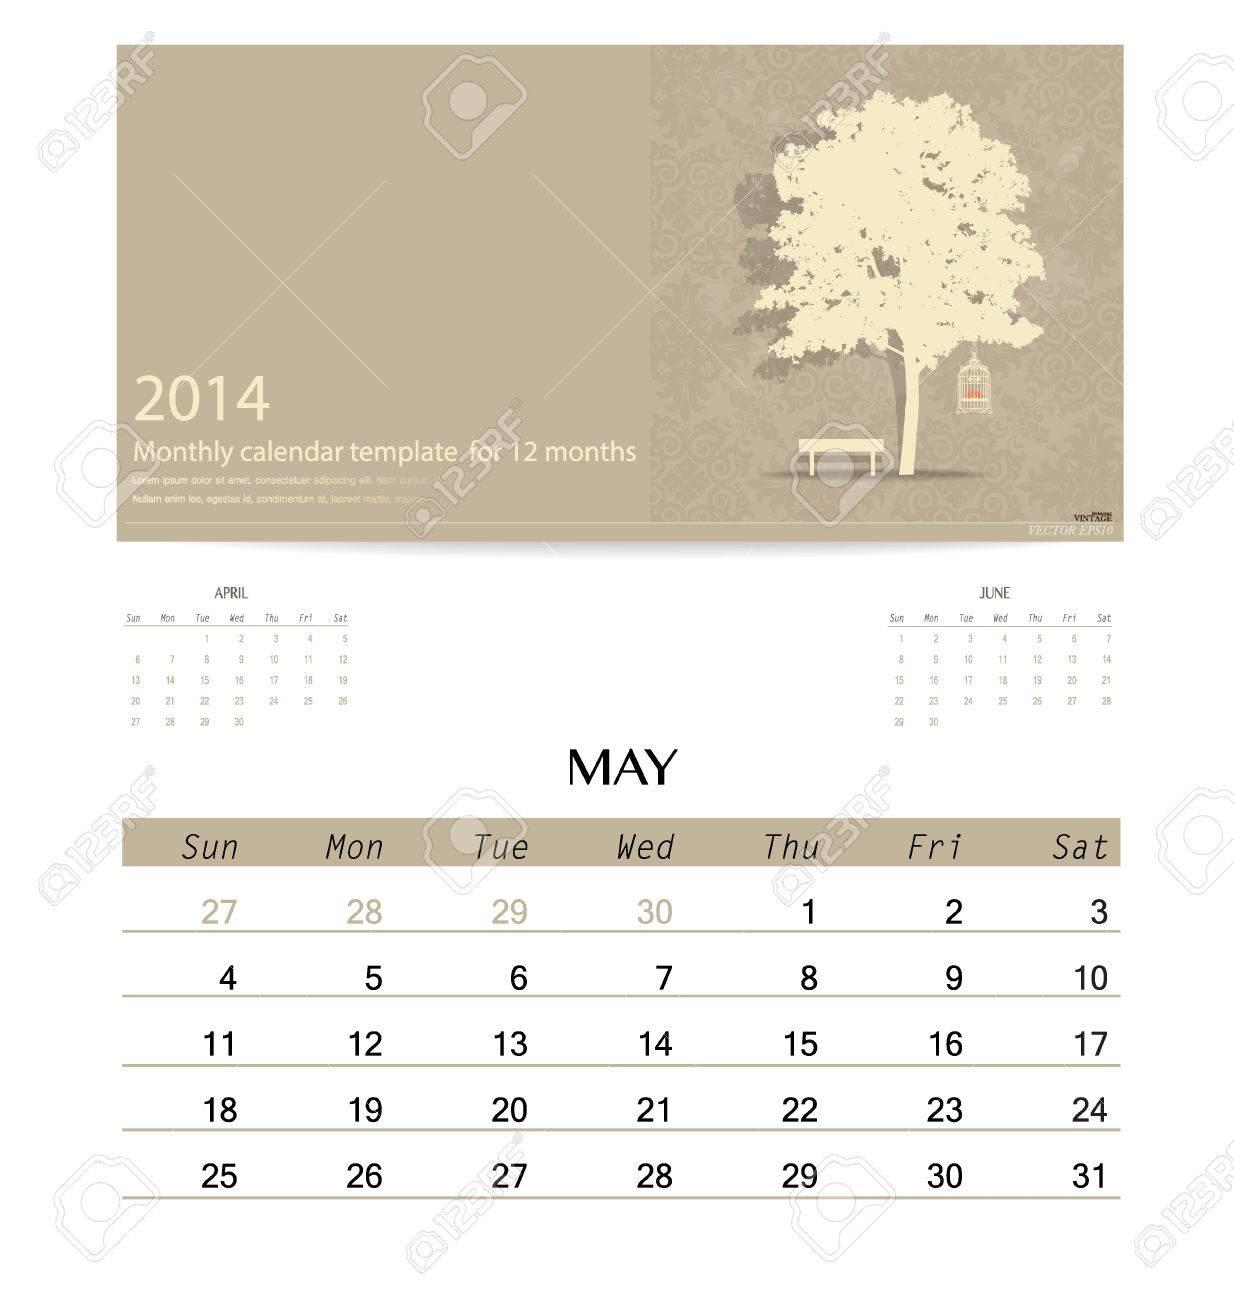 2014 Calendar Monthly Calendar Template For May Vector